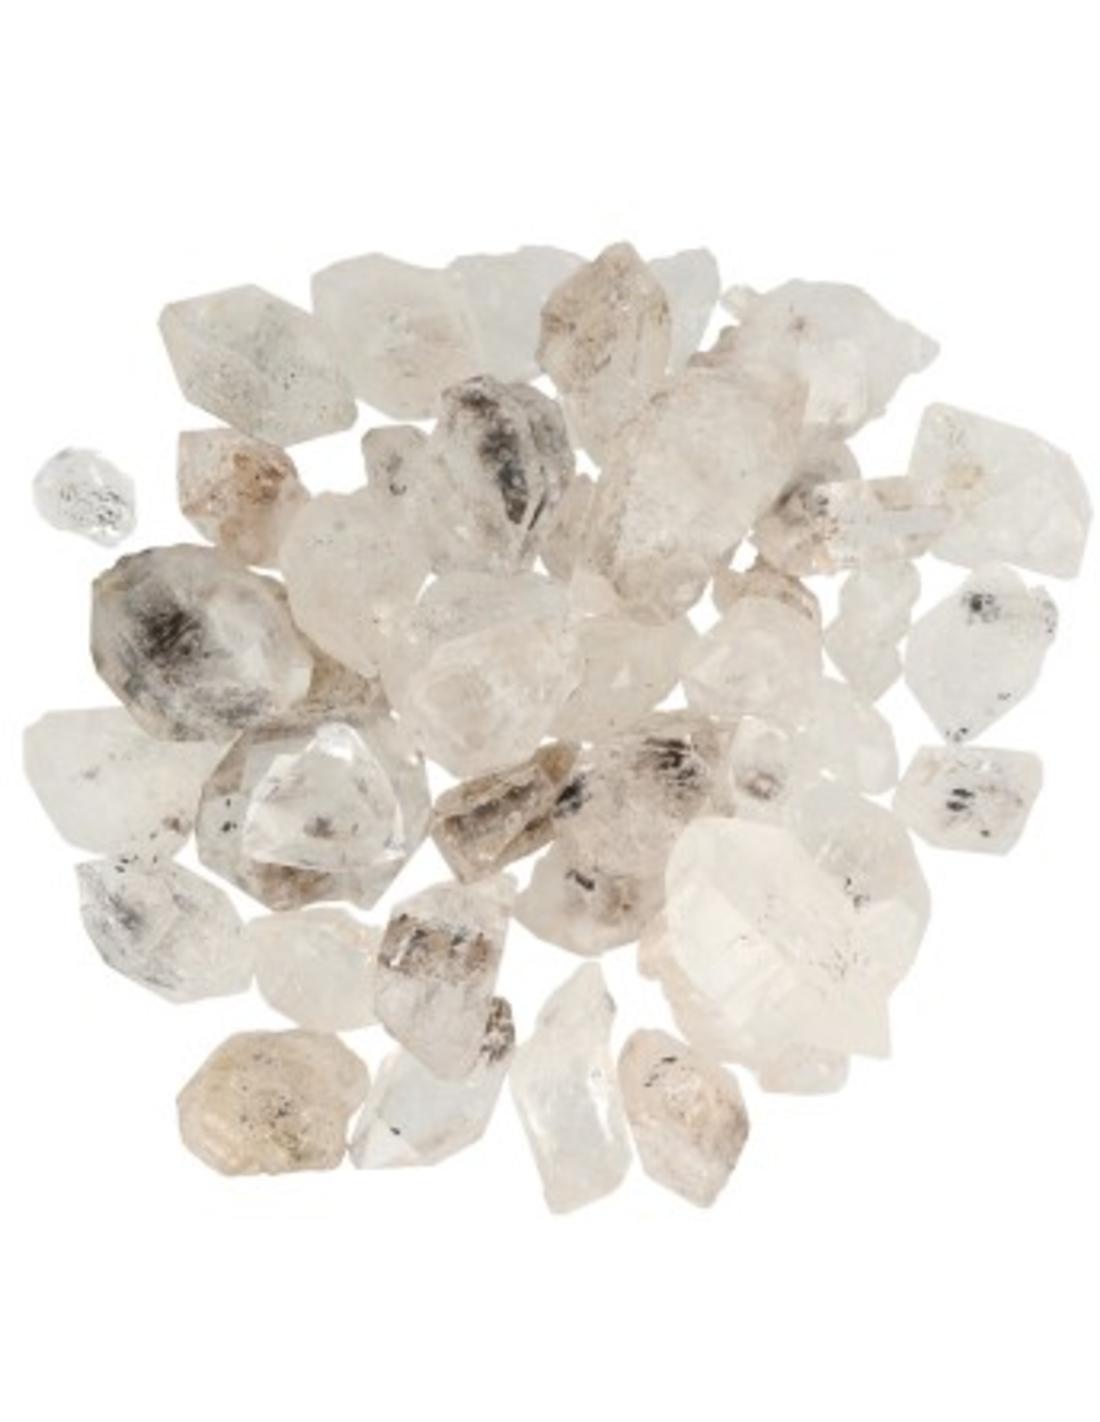 Herkimer diamant ruw 500 gr.